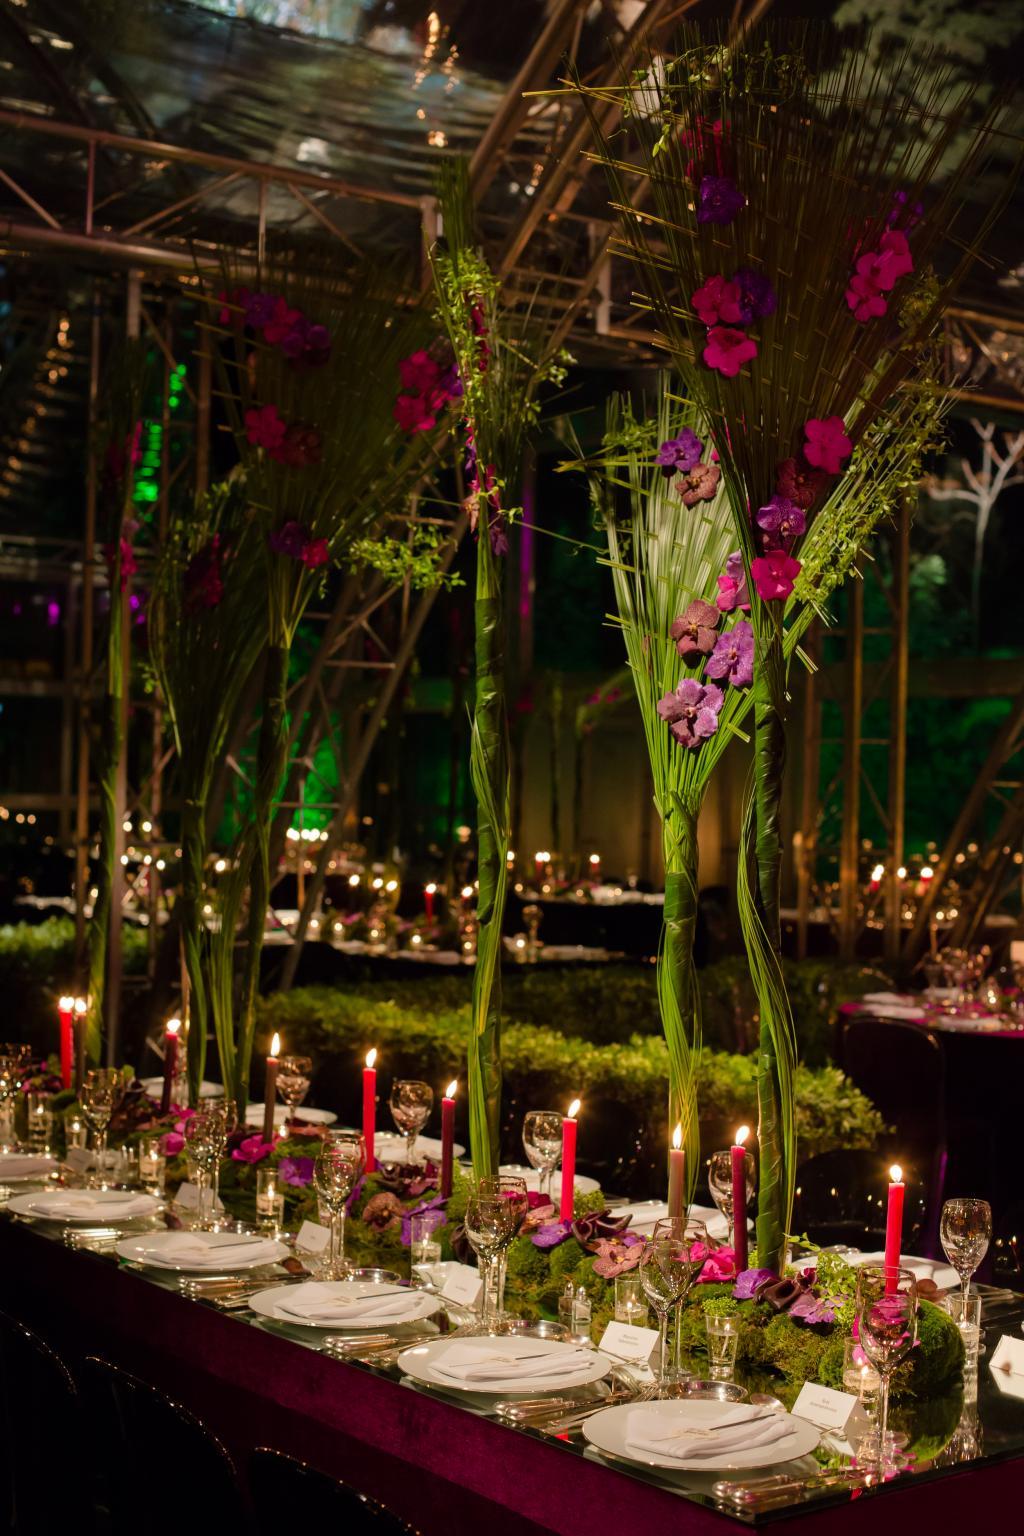 D&G Athens wedding - Image 9